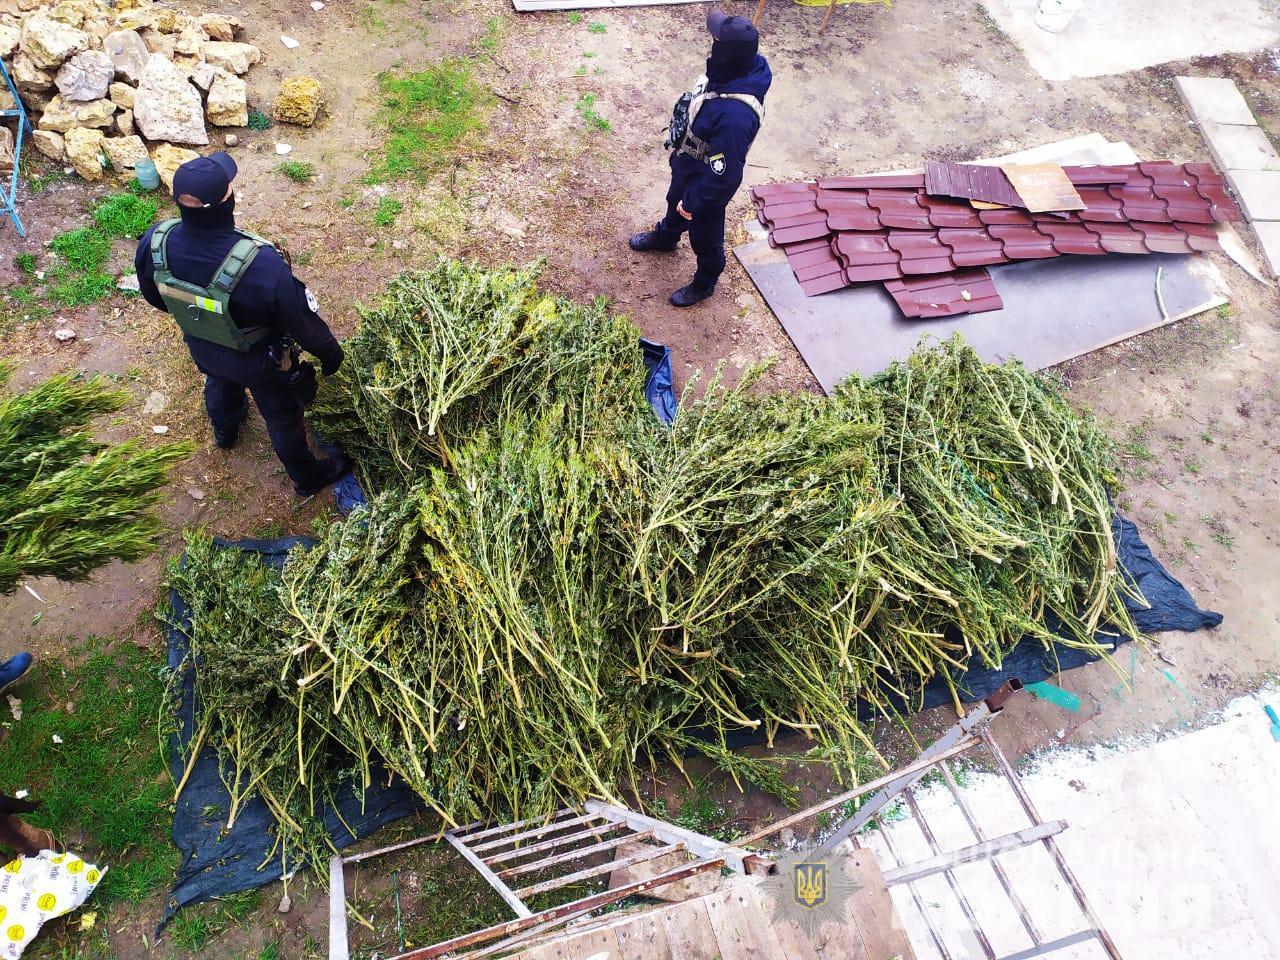 В Херсоне полицейские изъяли у зятя и тестя 60 кг марихуаны: фото